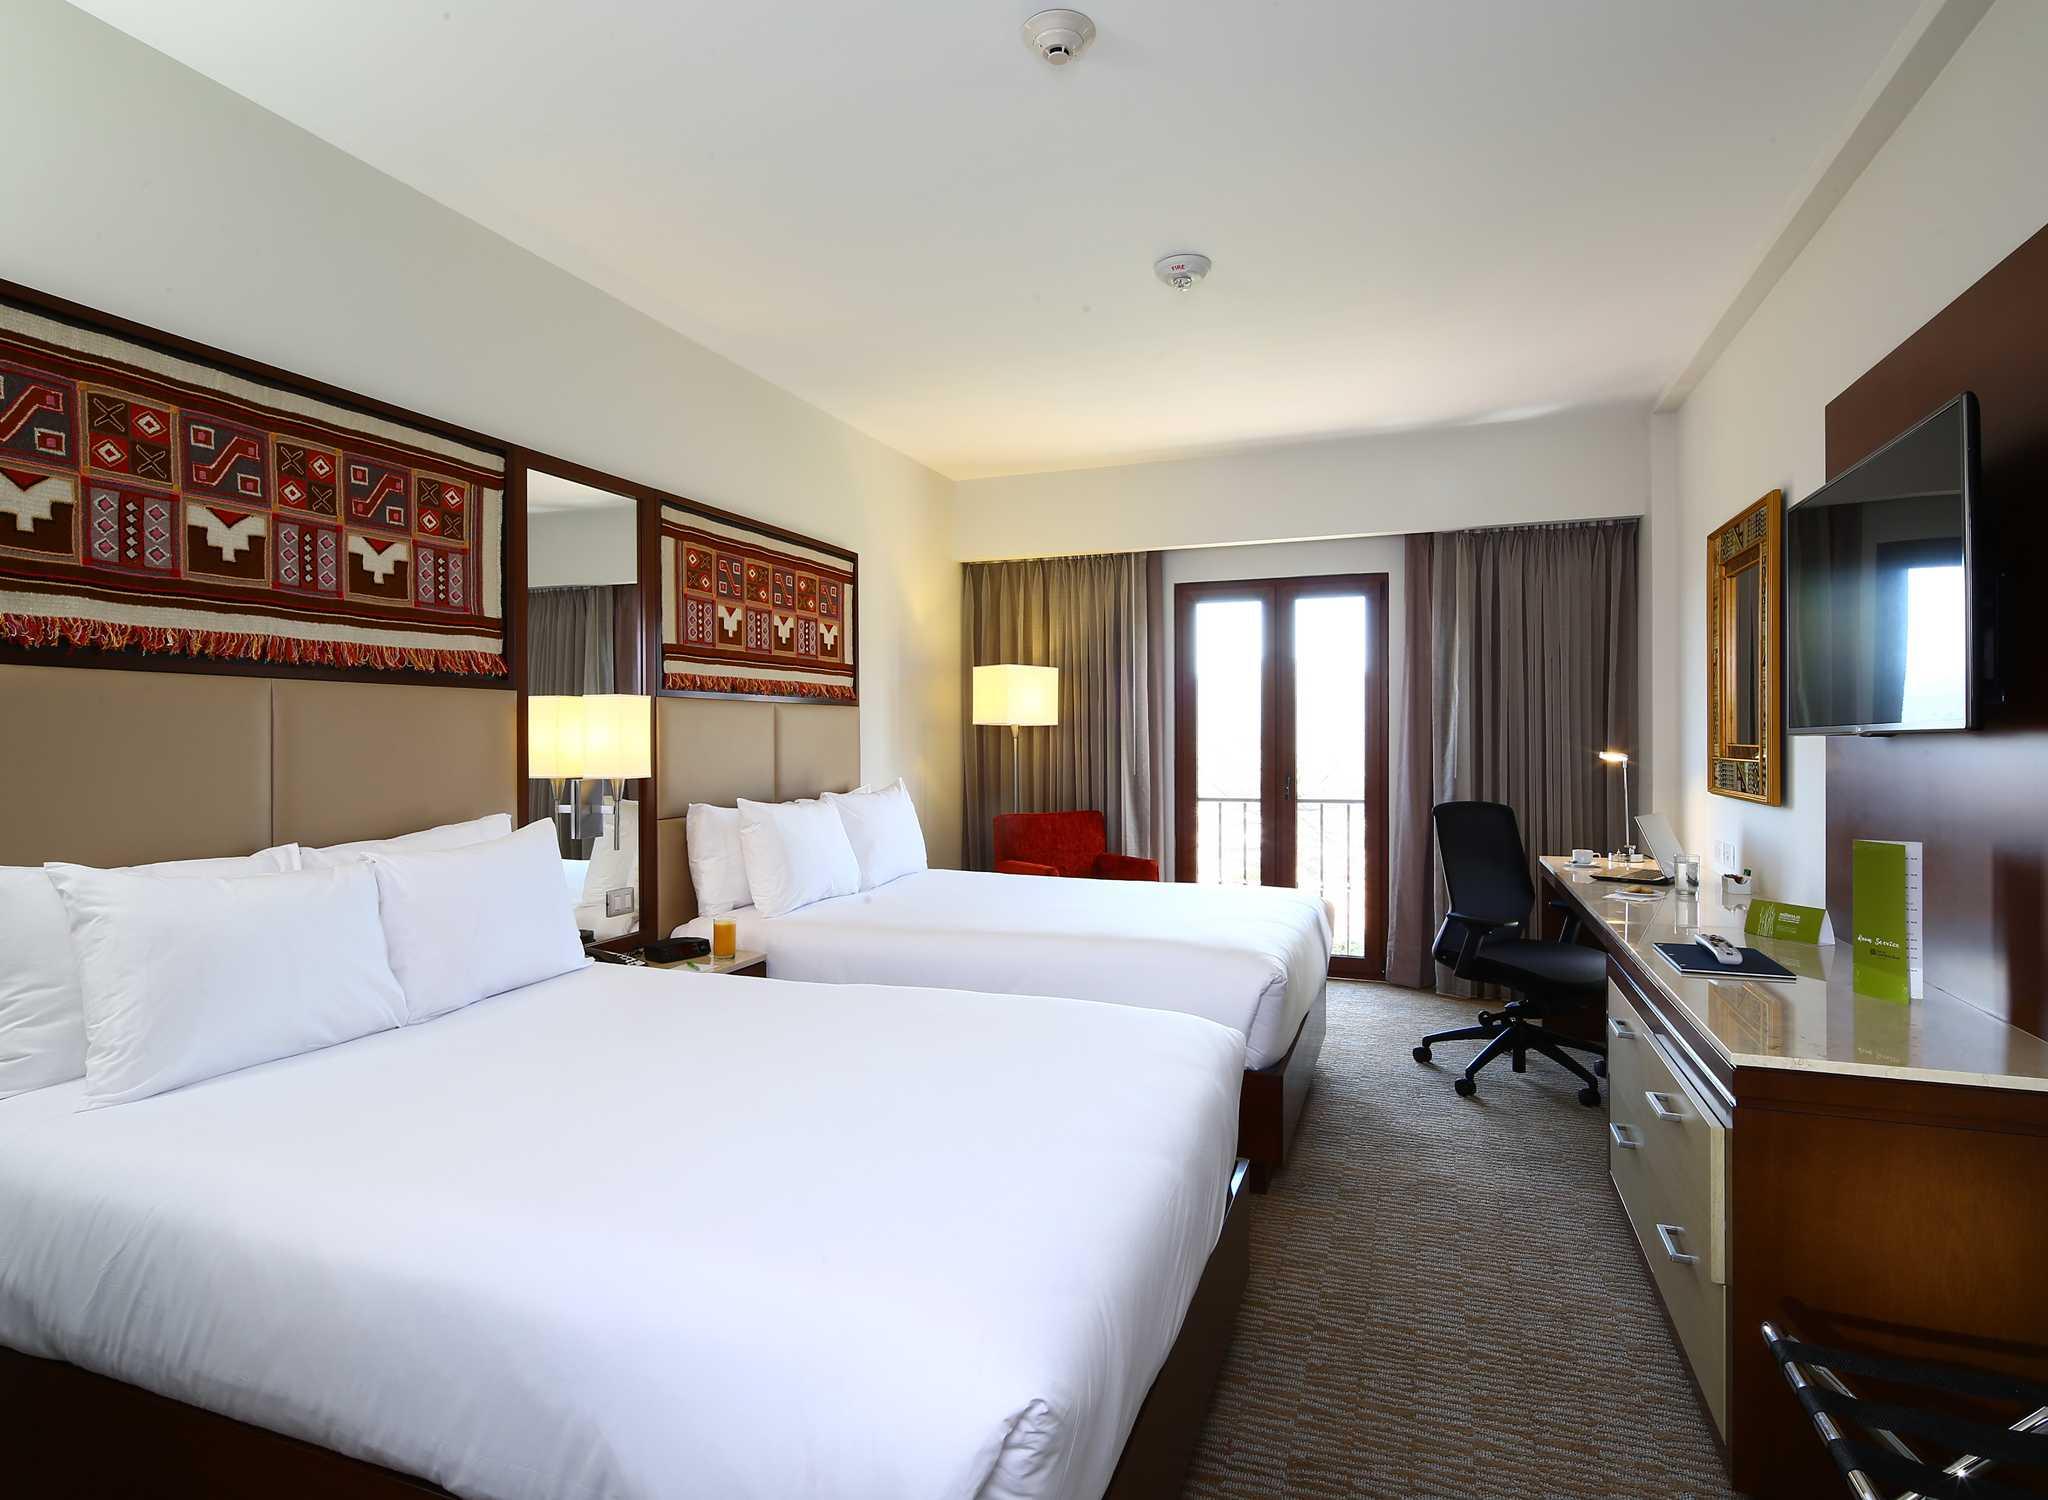 Hotel Hilton Garden Inn Cusco no Peru